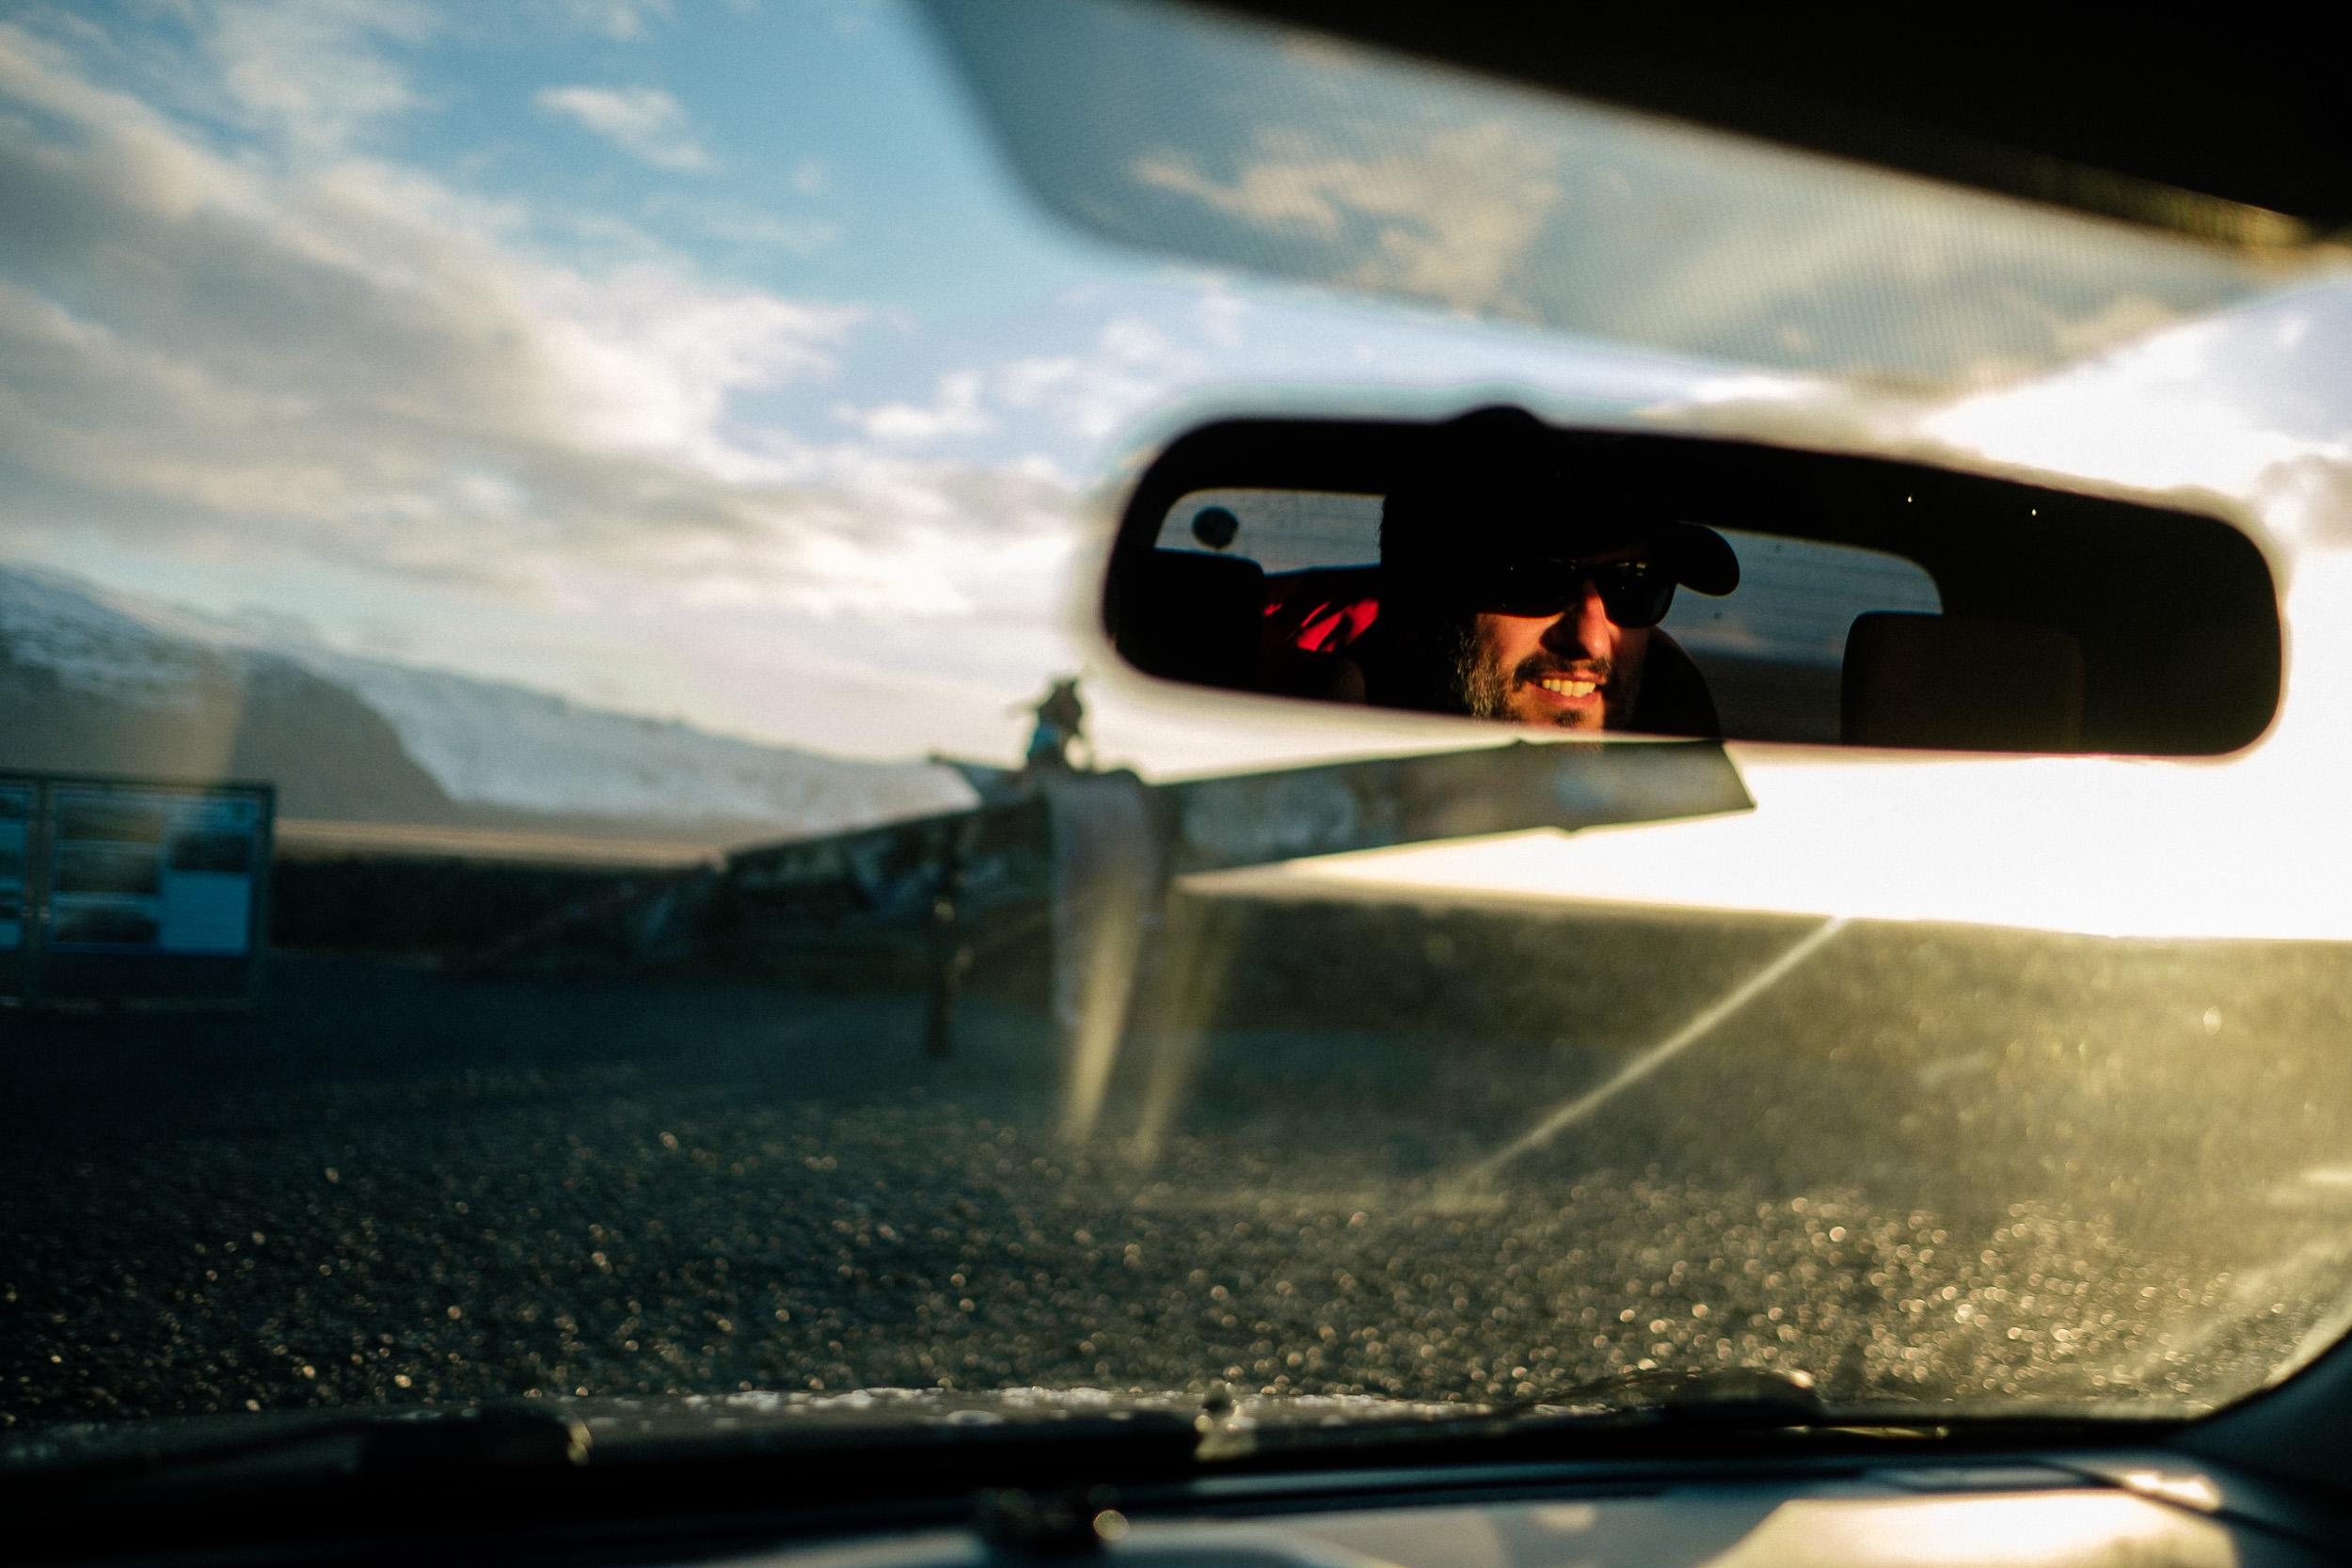 Collective_Wander_Iceland_Photographers_Trip_073.jpg